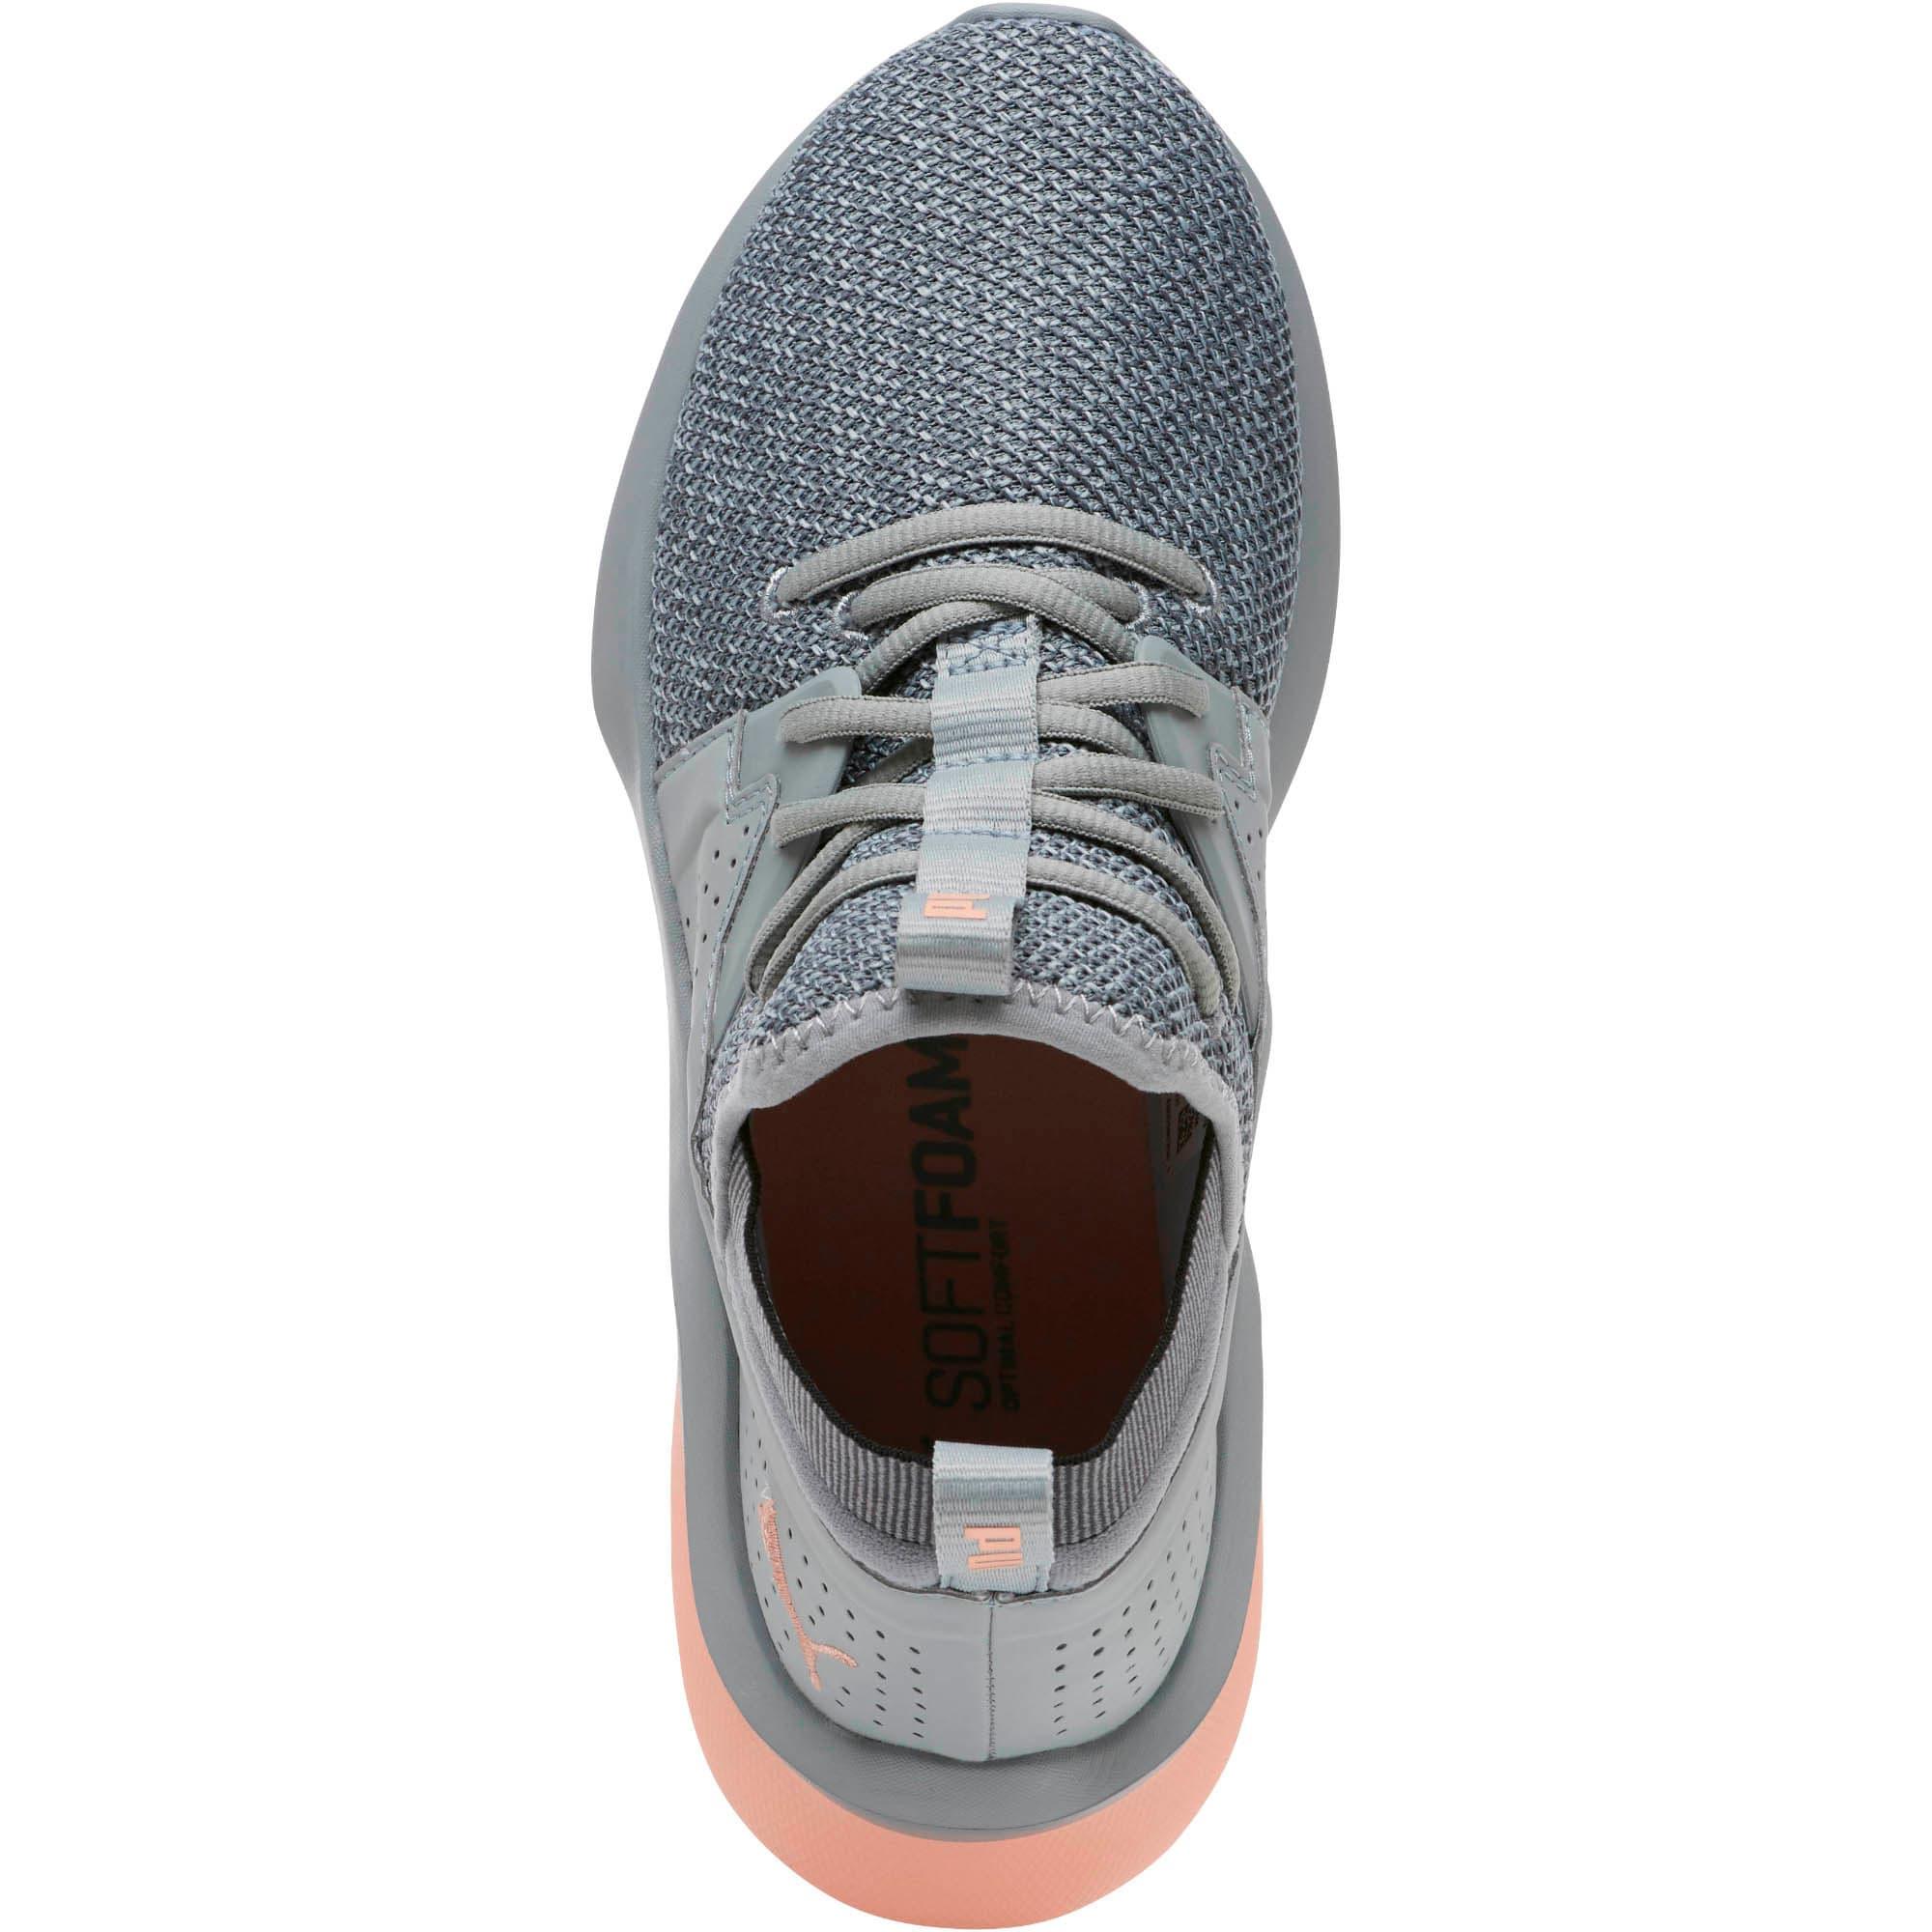 Thumbnail 5 of Emergence Women's Sneakers, Quarry-Peach Bud, medium